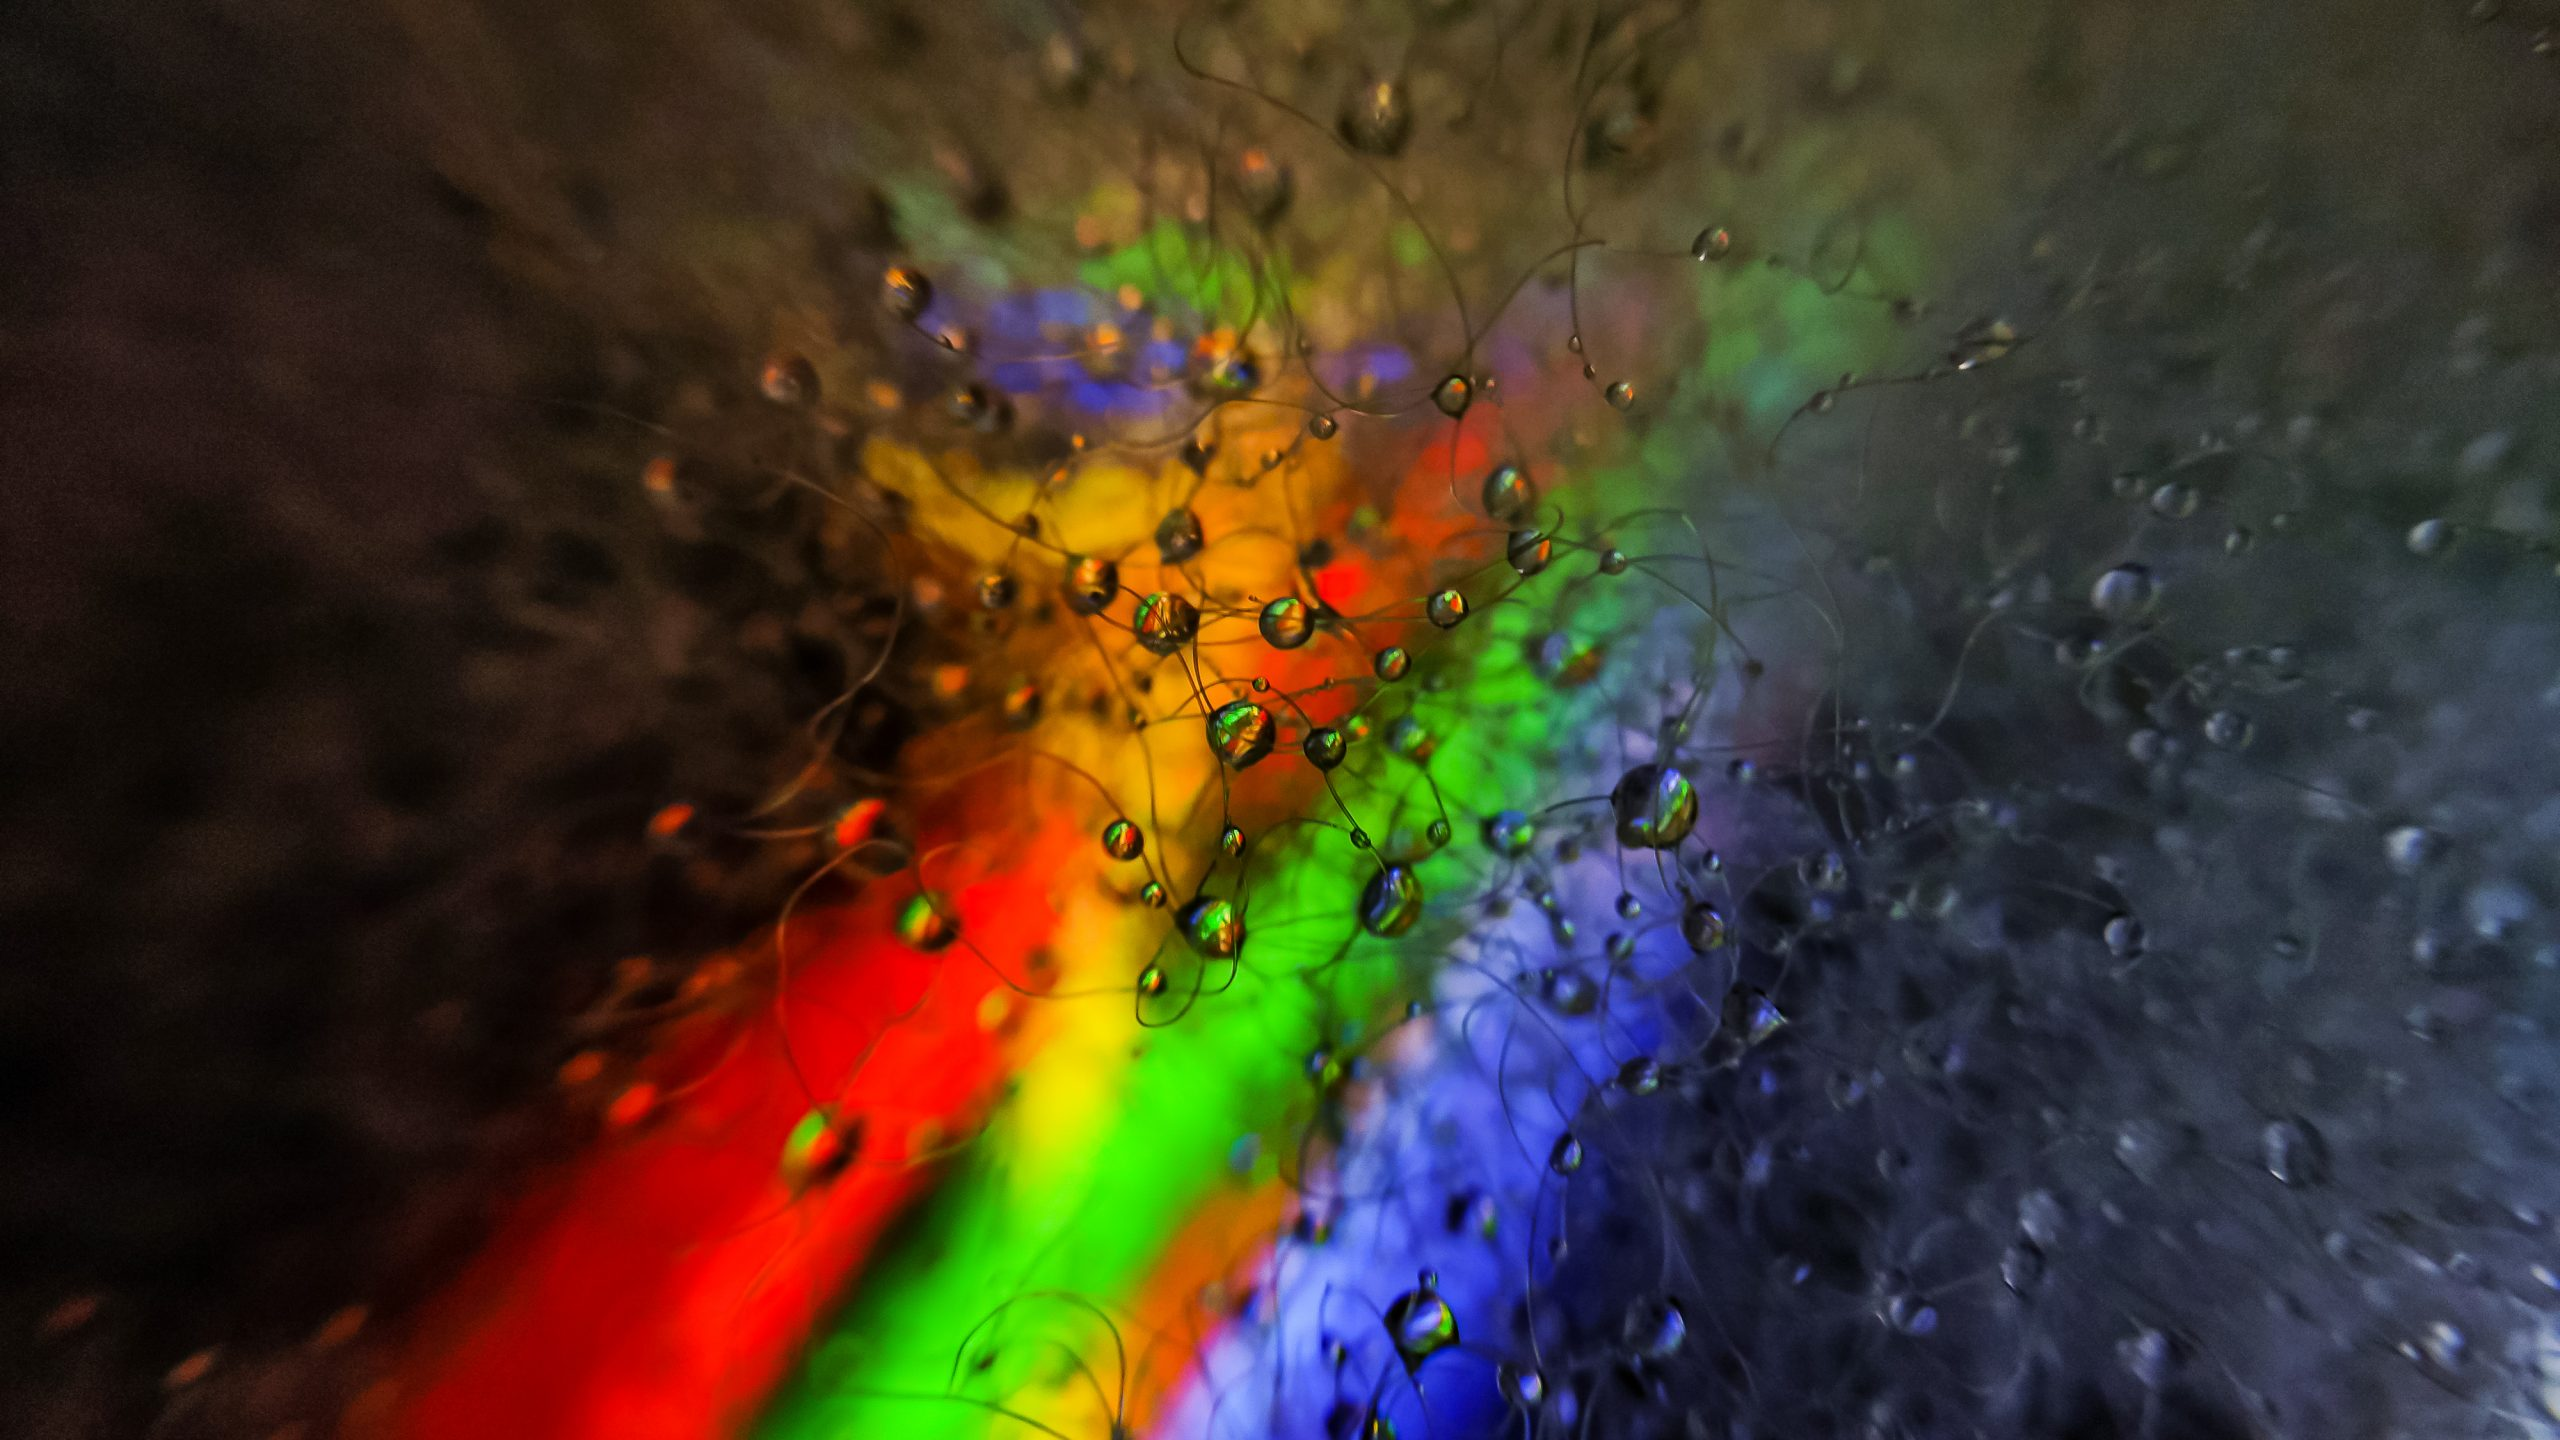 Water Drop on Fiber sheet